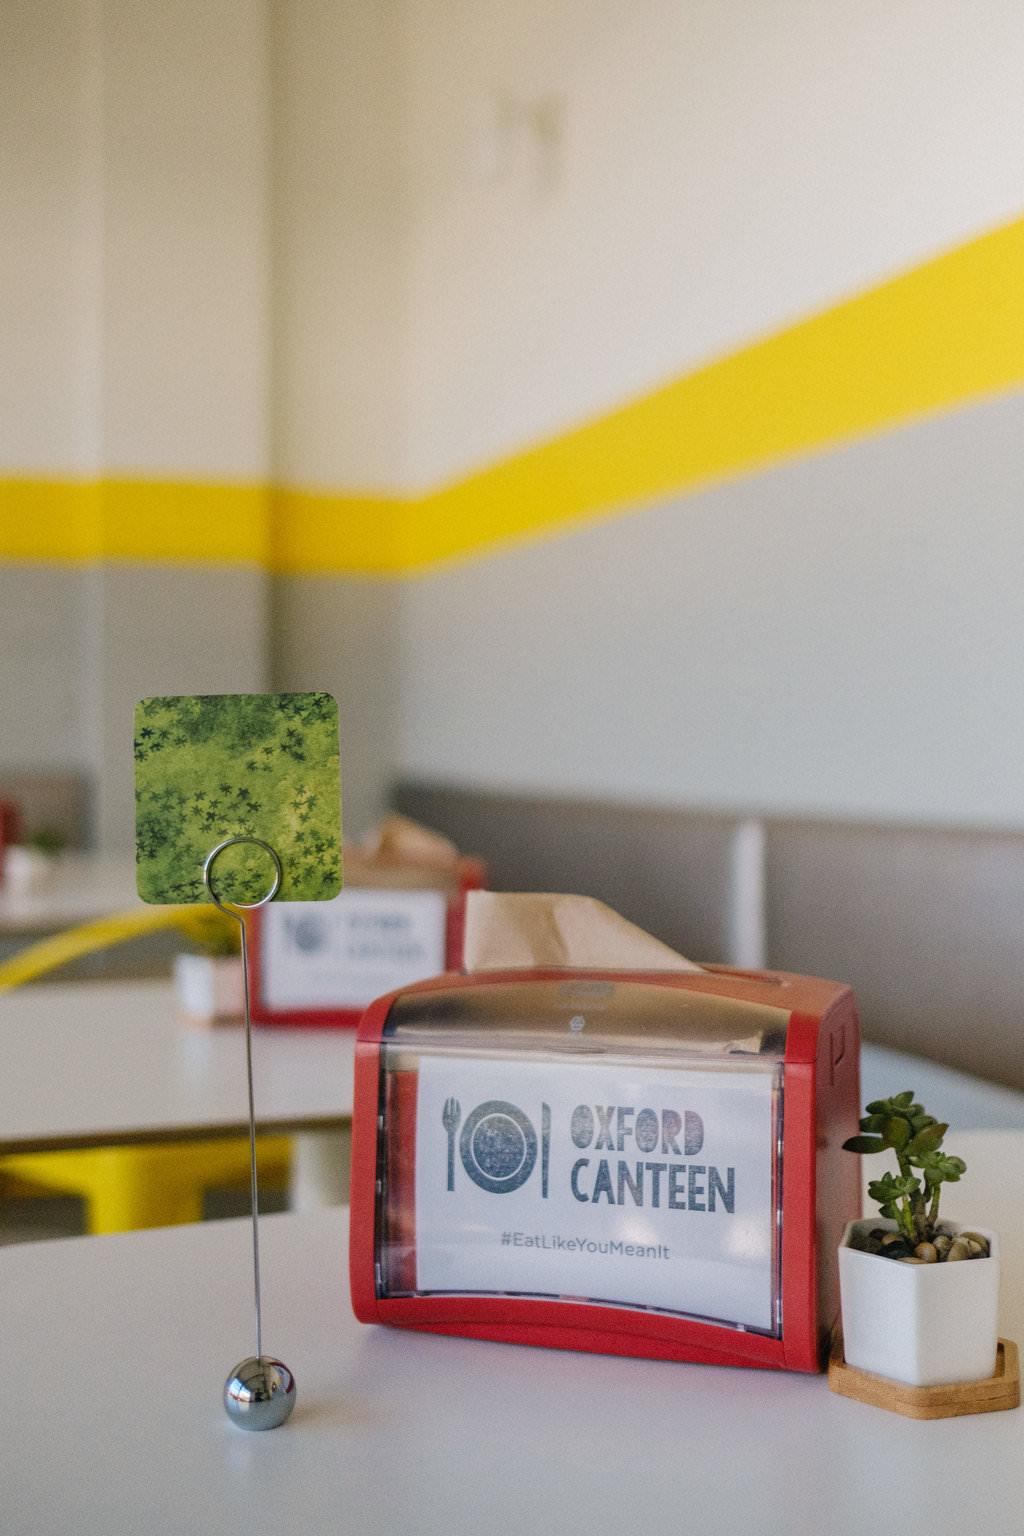 oxford-canteen-local-restaurant-11.JPG